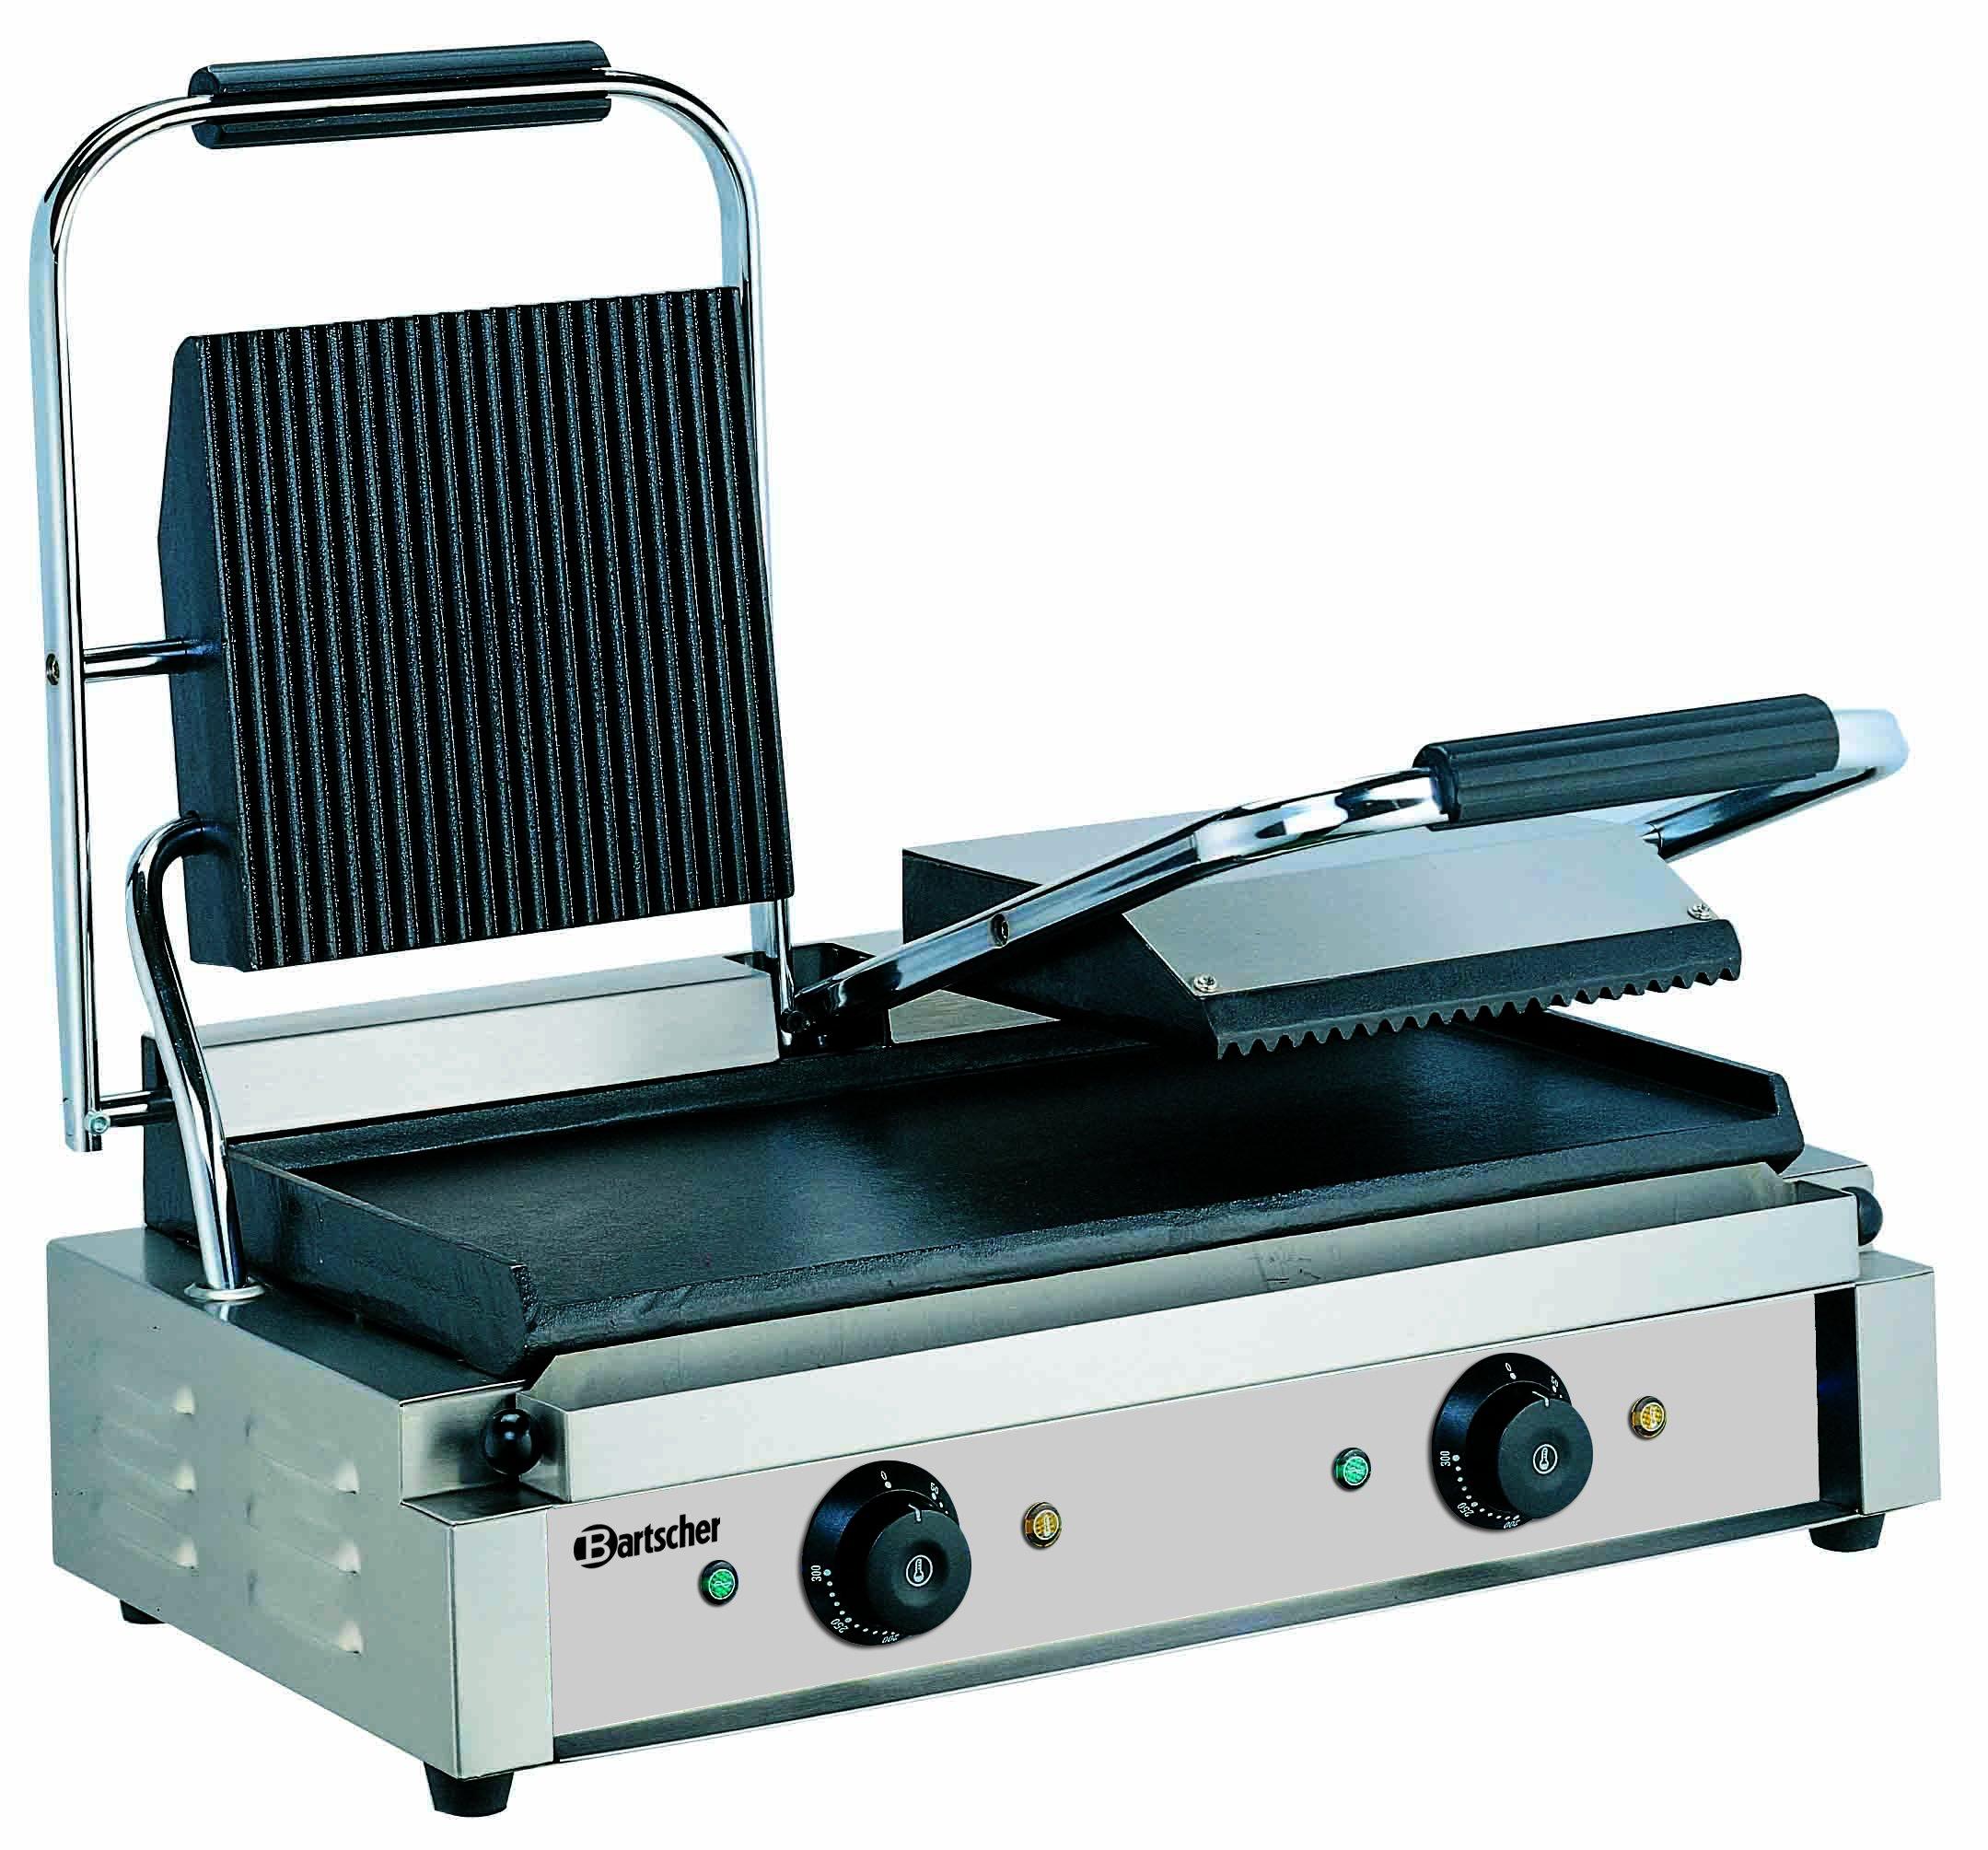 A150673 - Bartscher Elektro-Doppel-Kontaktgrill